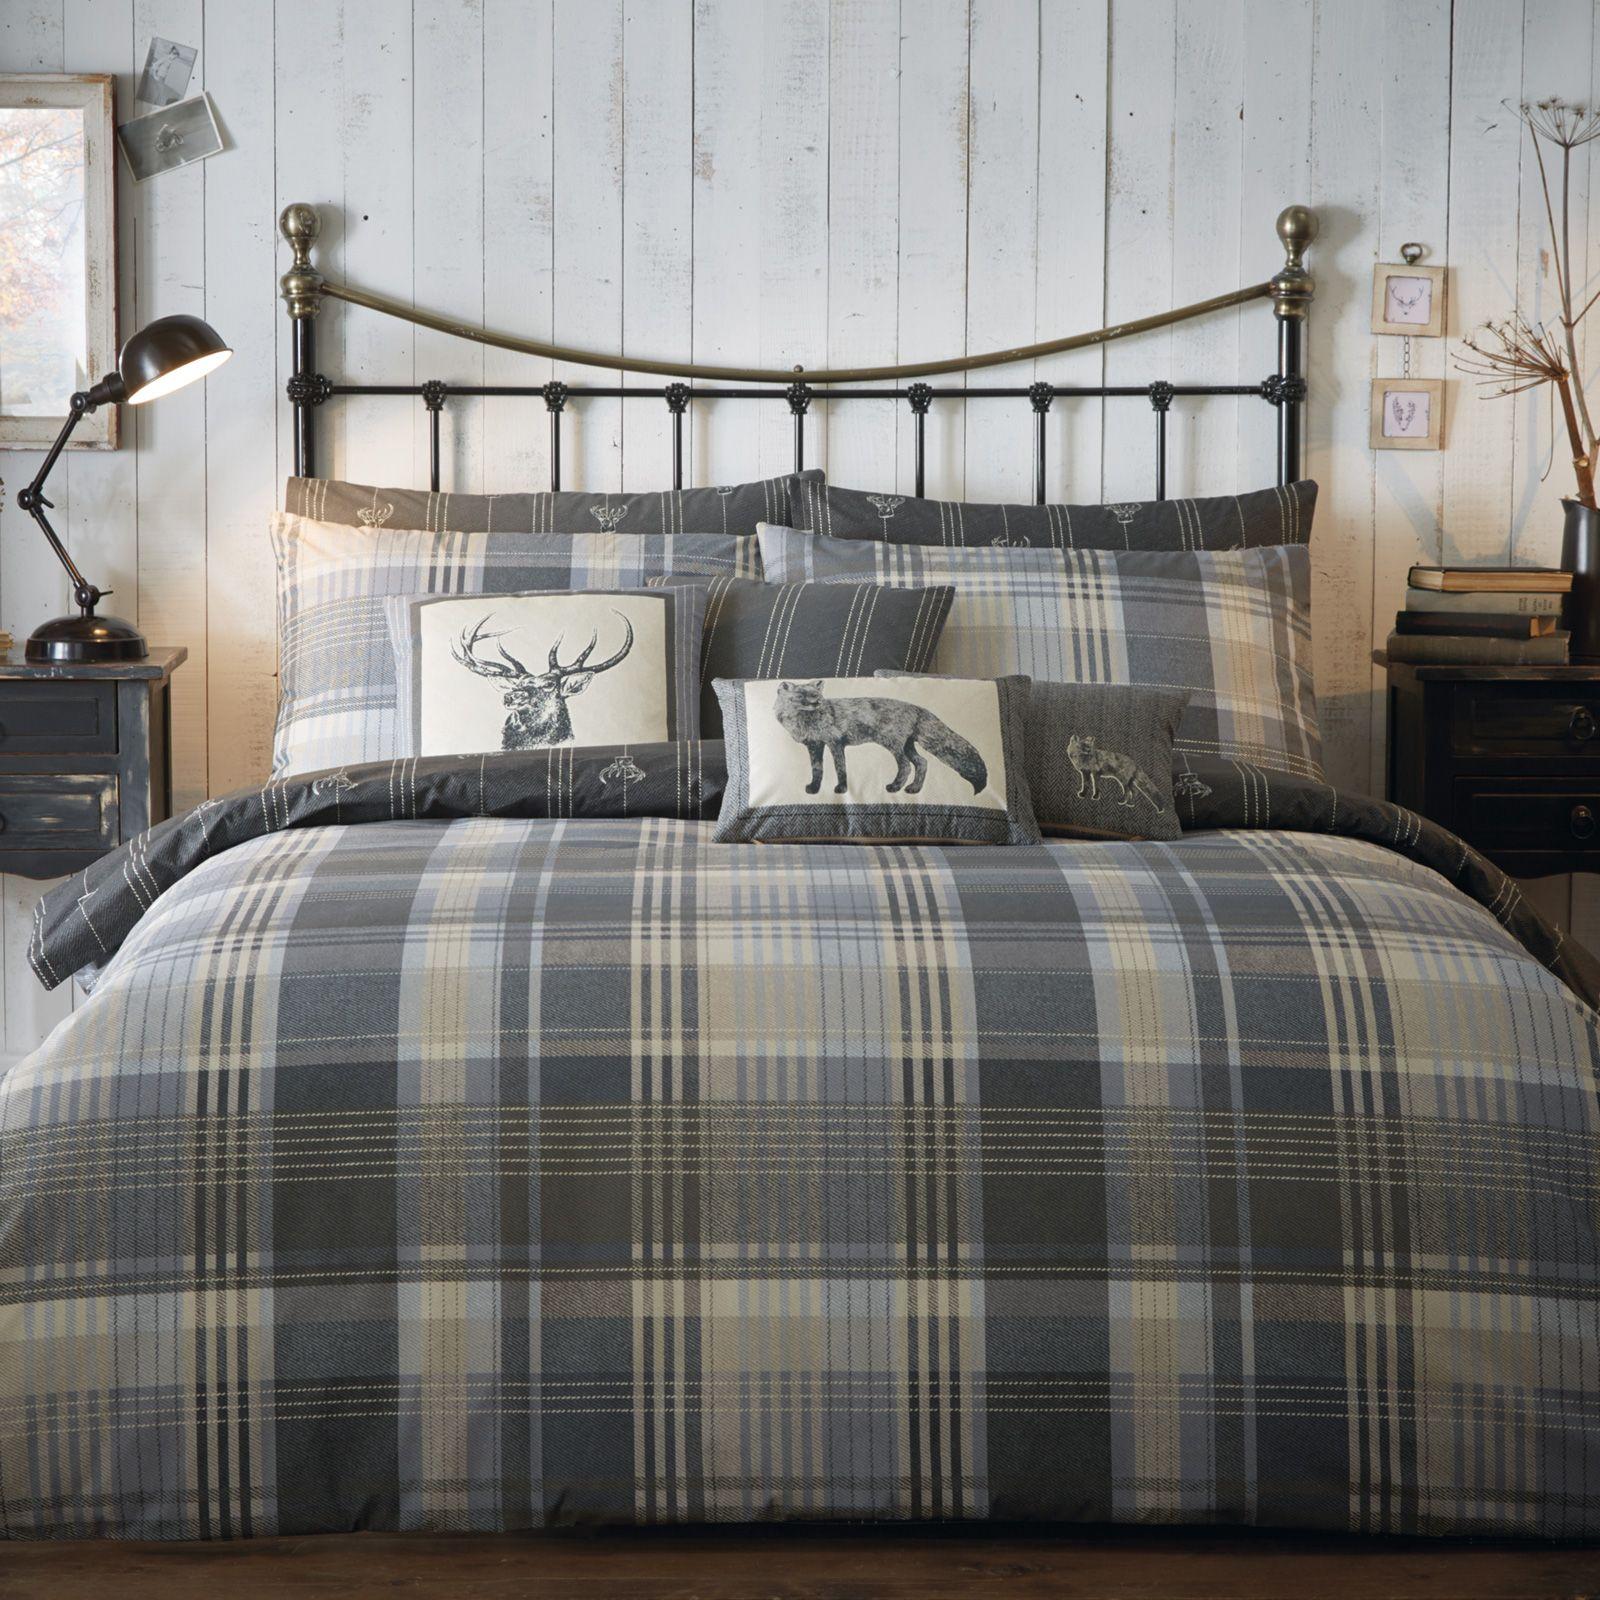 Tartan 100 Brushed Cotton Flannelette Duvet Cover Set Reversible Stag Bedding